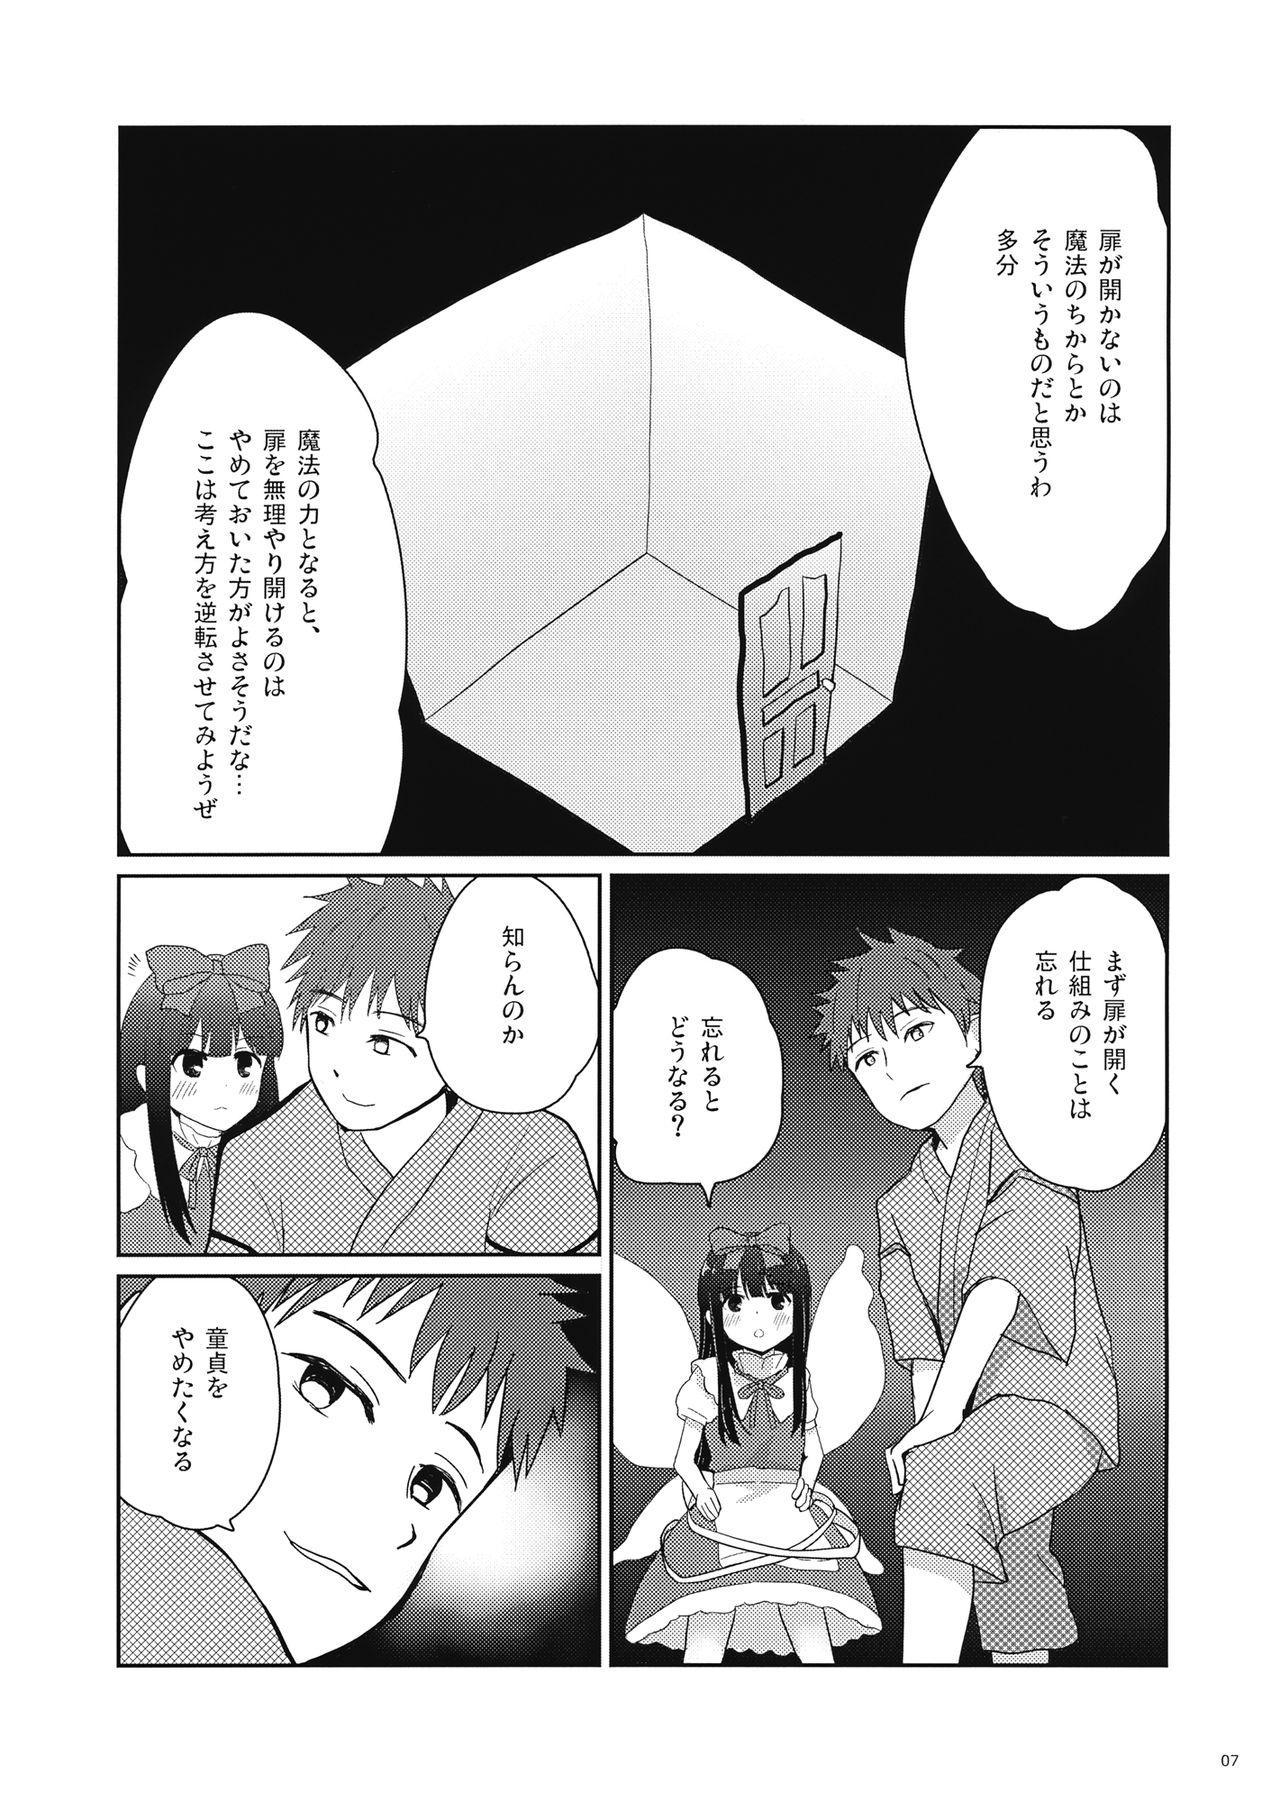 (C92) [Rabbit House (Usako)] SAN-do Star-chan (Touhou Project) 5